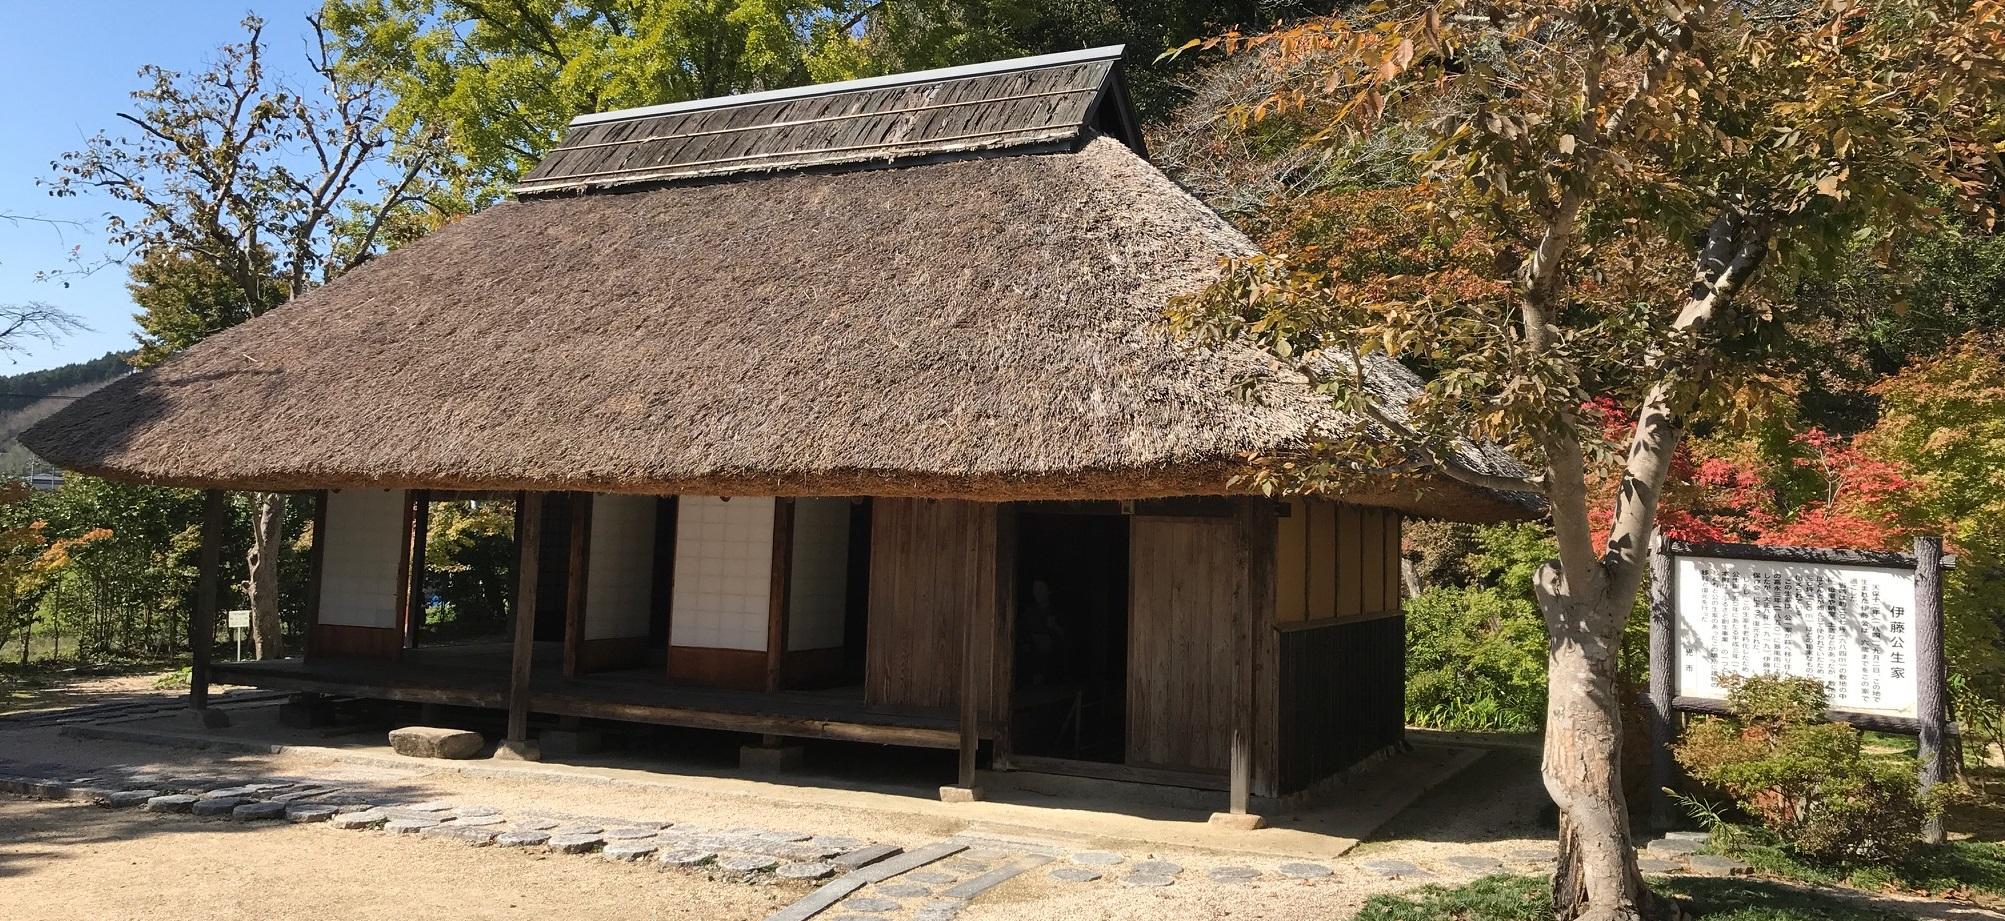 伊藤博文公の生家